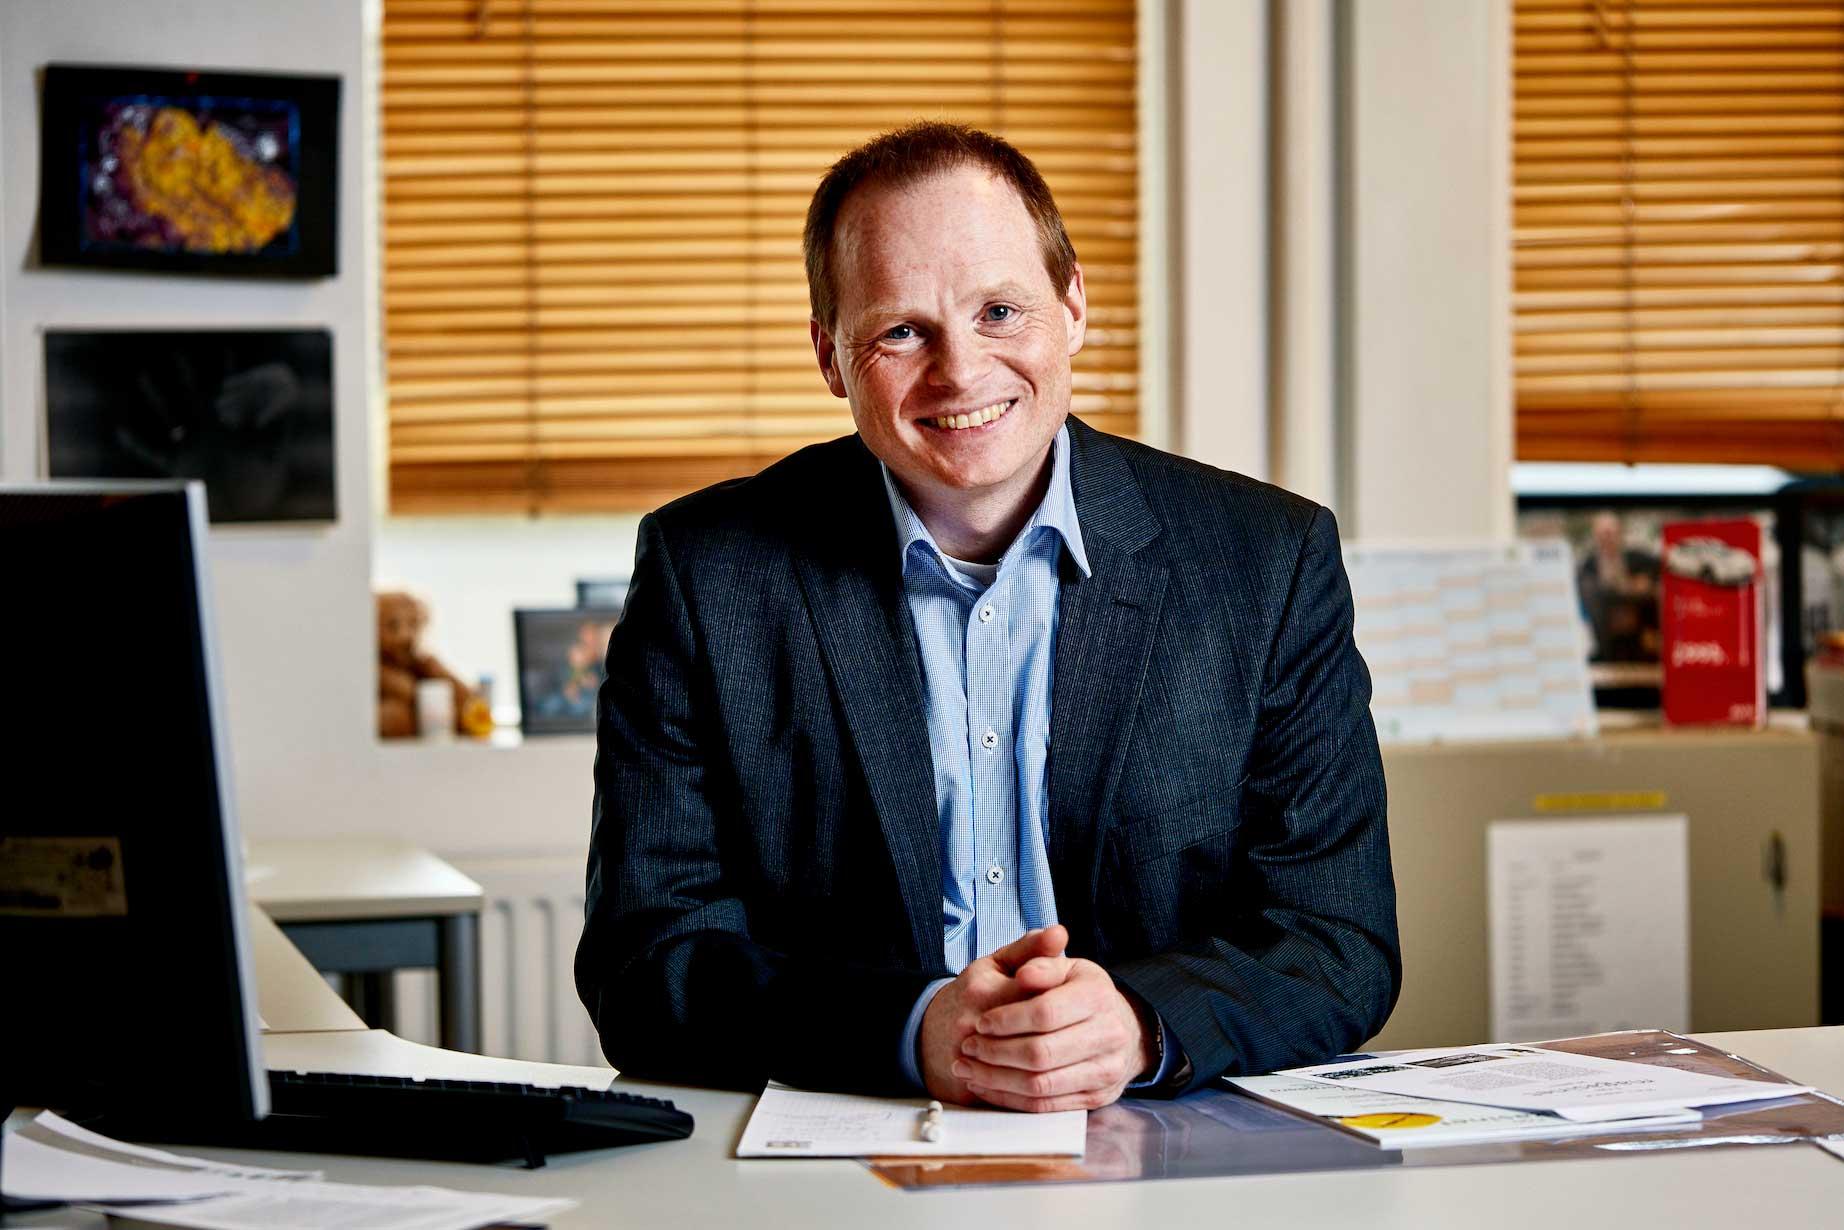 KLS PurePrint, CEO Kasper Larsen